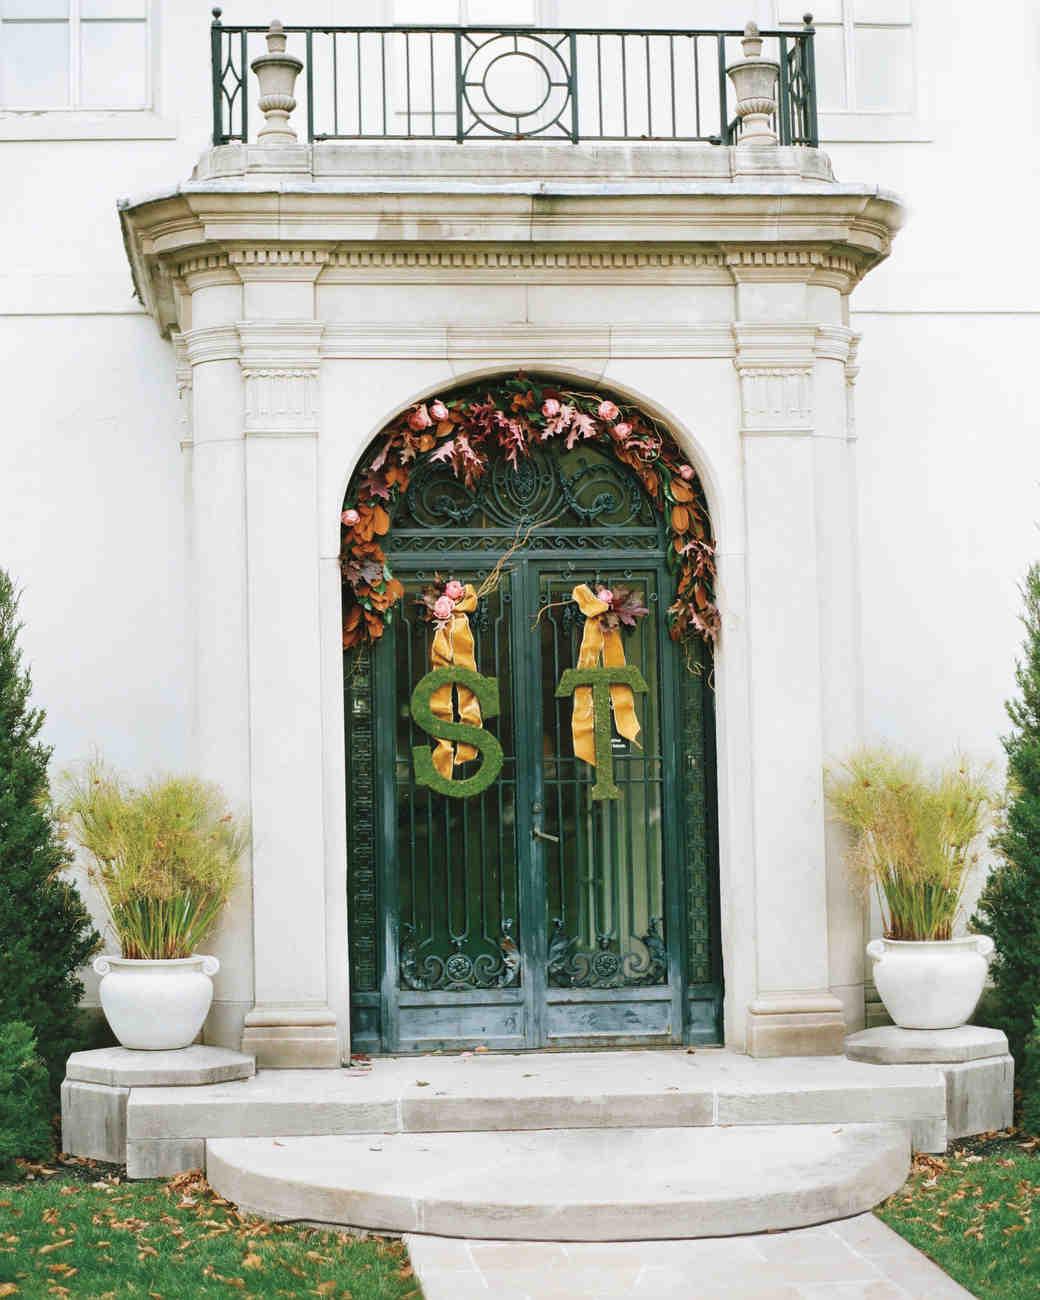 sarah-tom-entryway-79010012-mwds110093.jpg